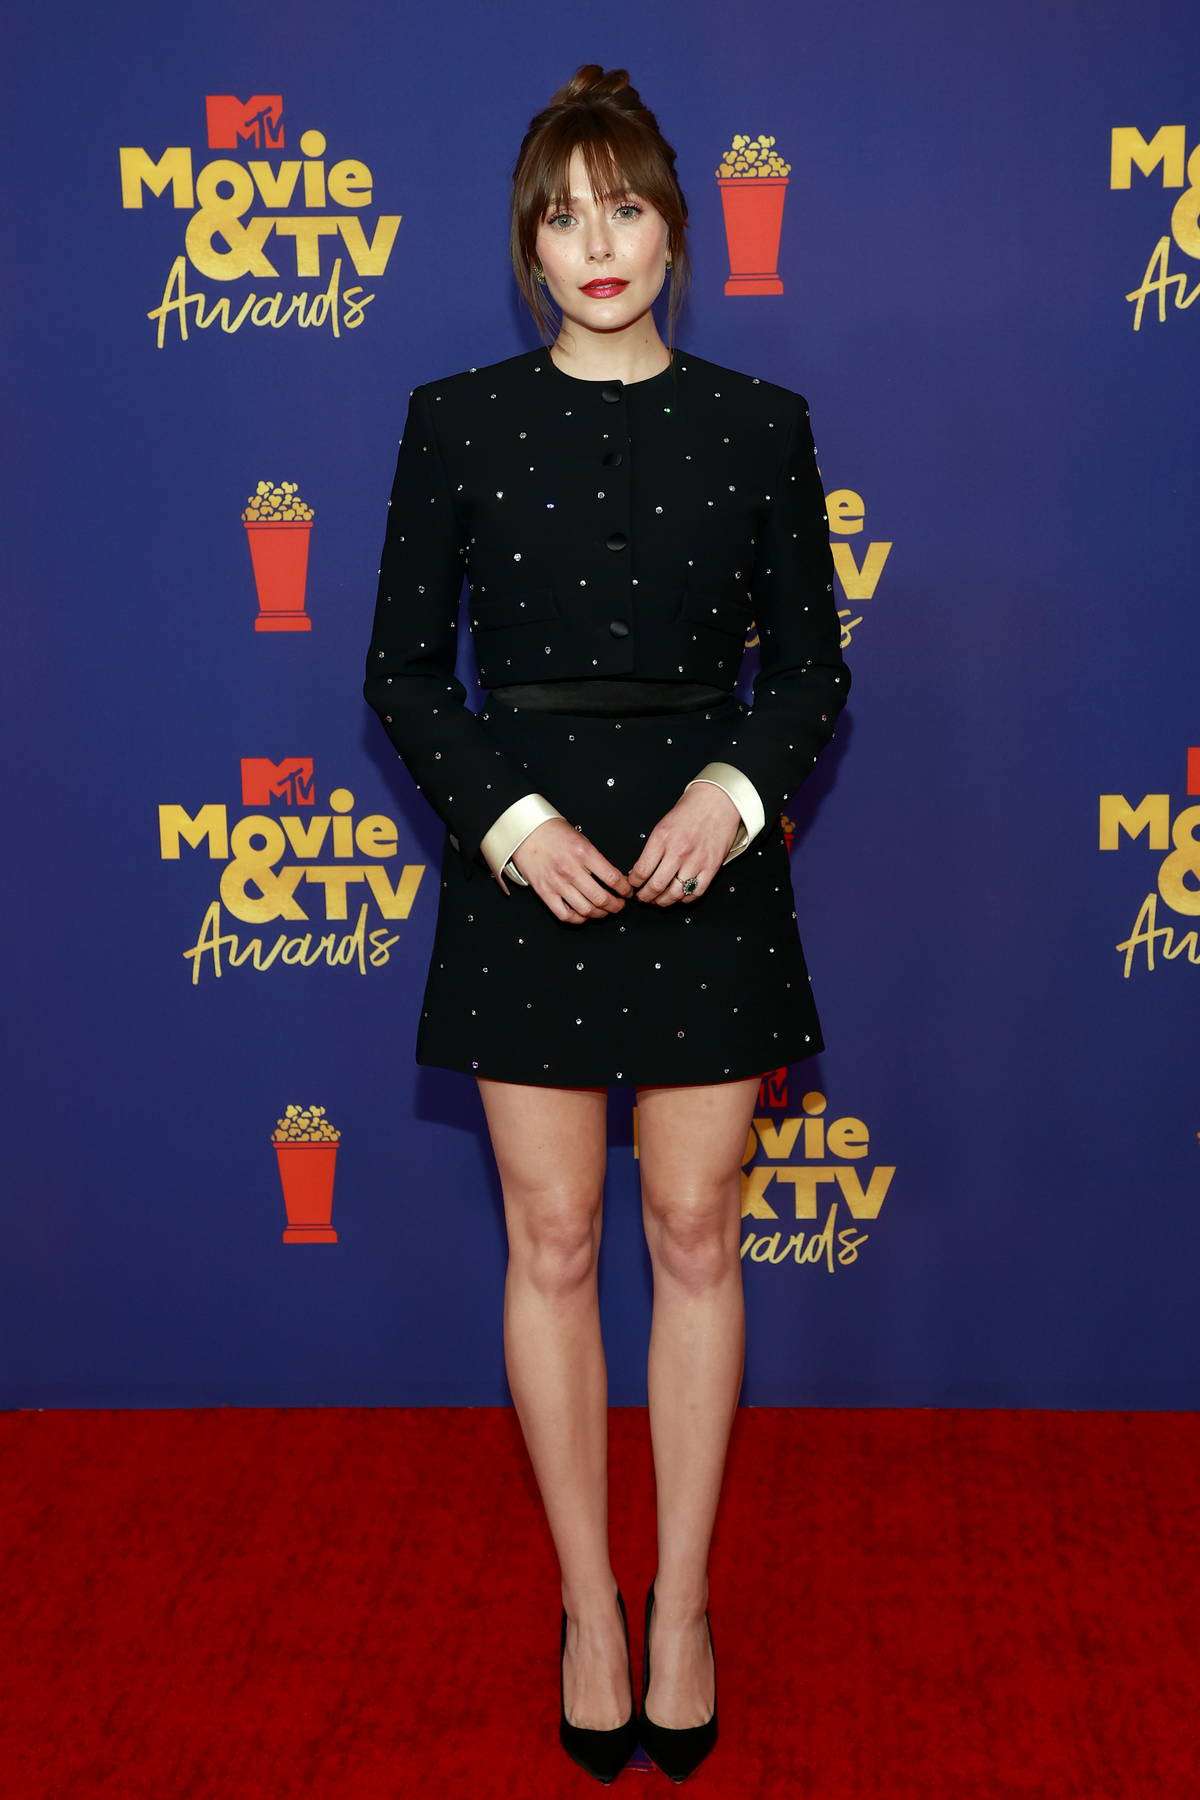 Elizabeth Olsen attends the 2021 MTV Movie & TV Awards at the Hollywood Palladium in Los Angeles